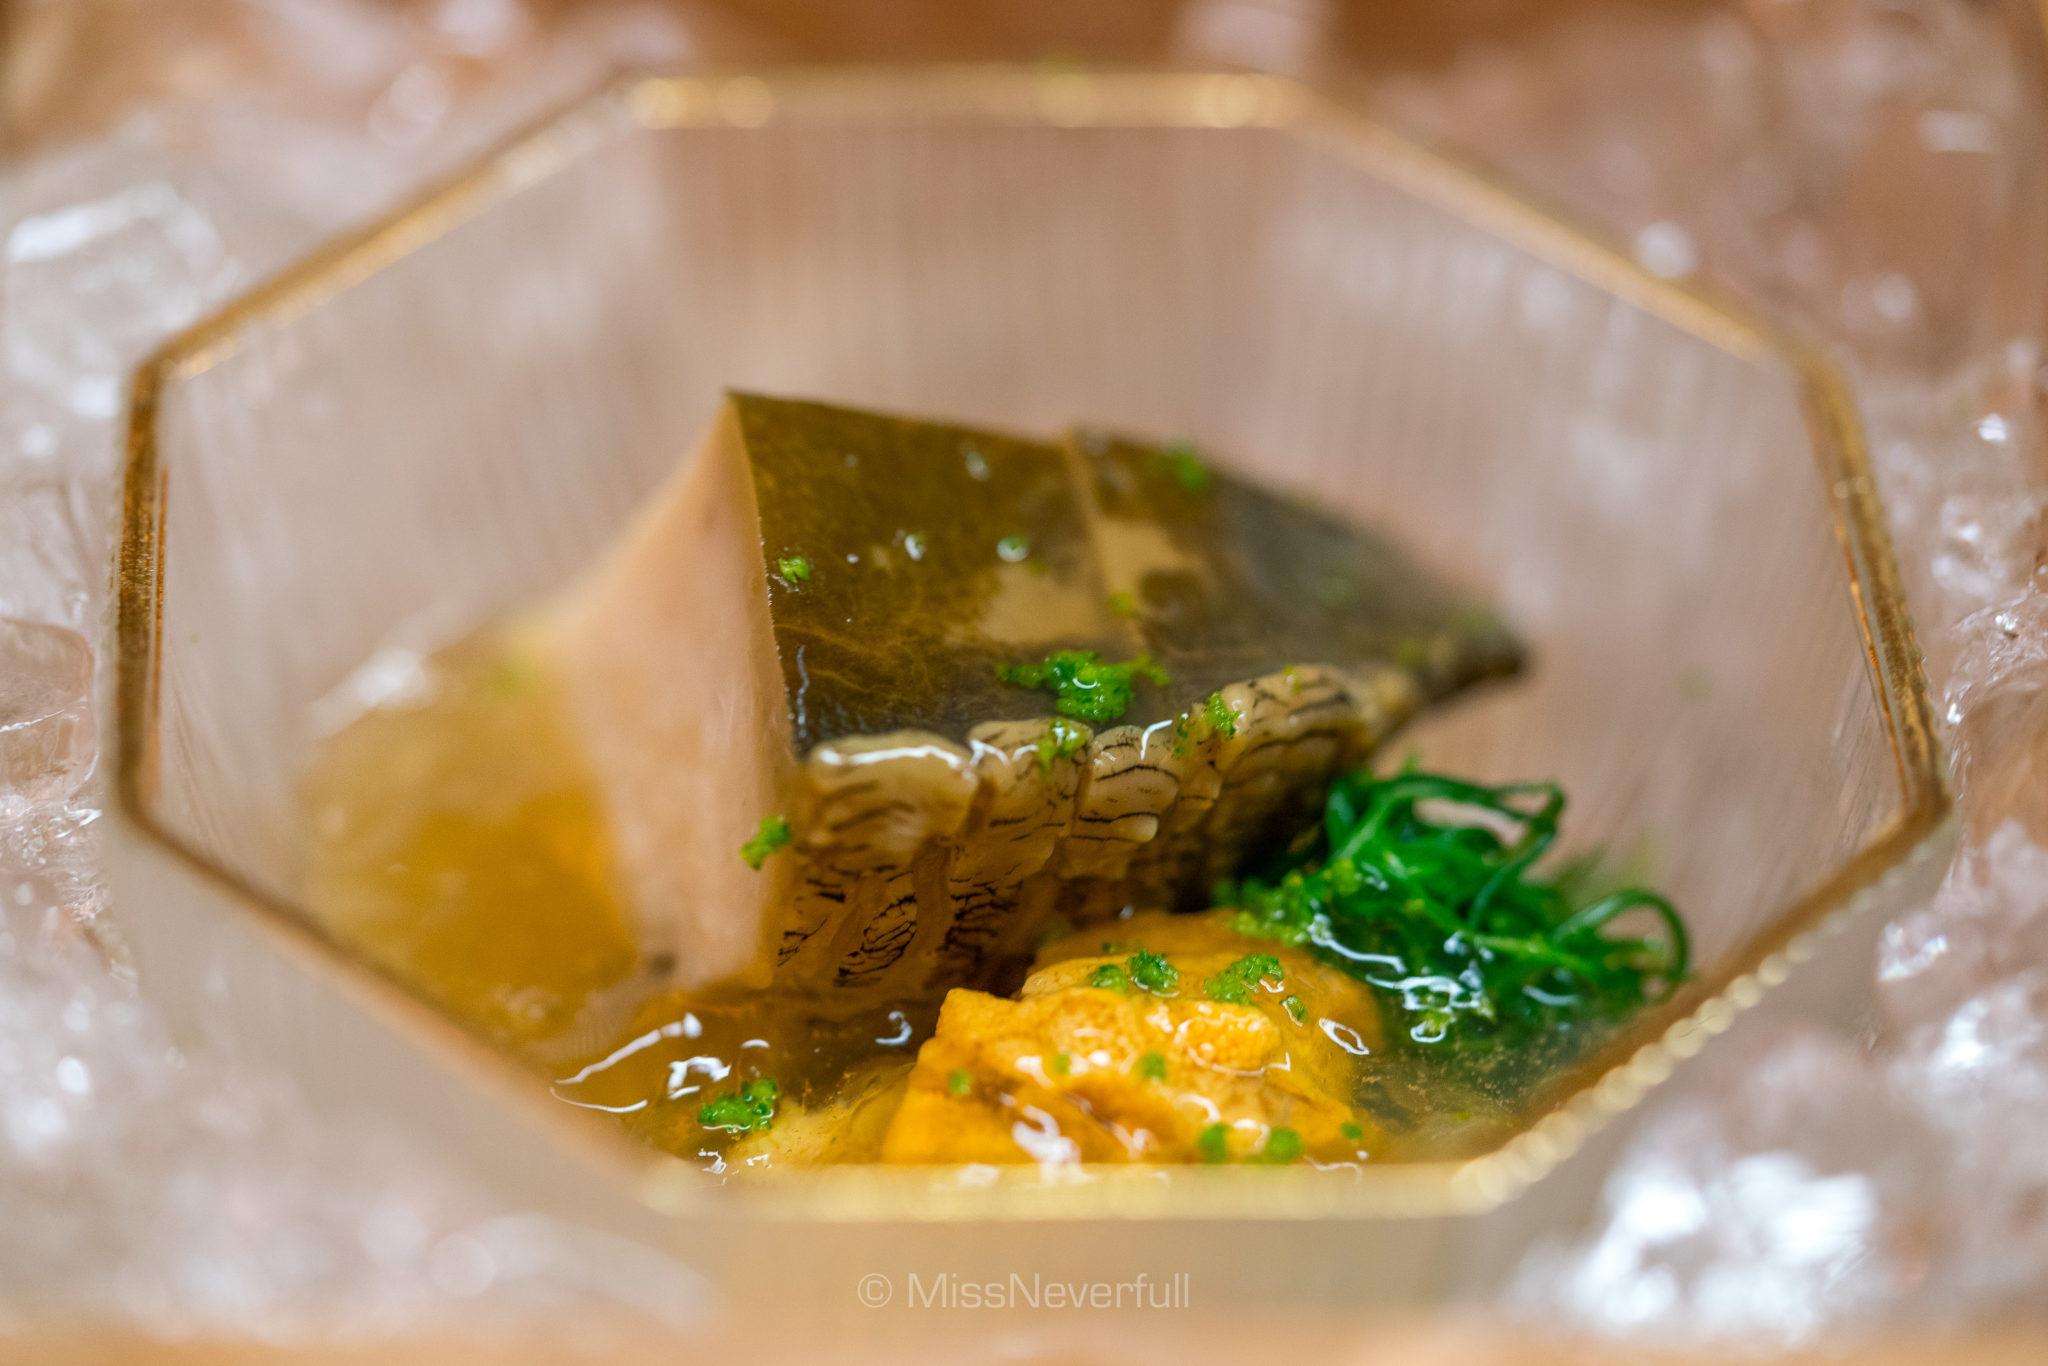 1. Abalone with sea urchin | 鮑と雲丹の先付け